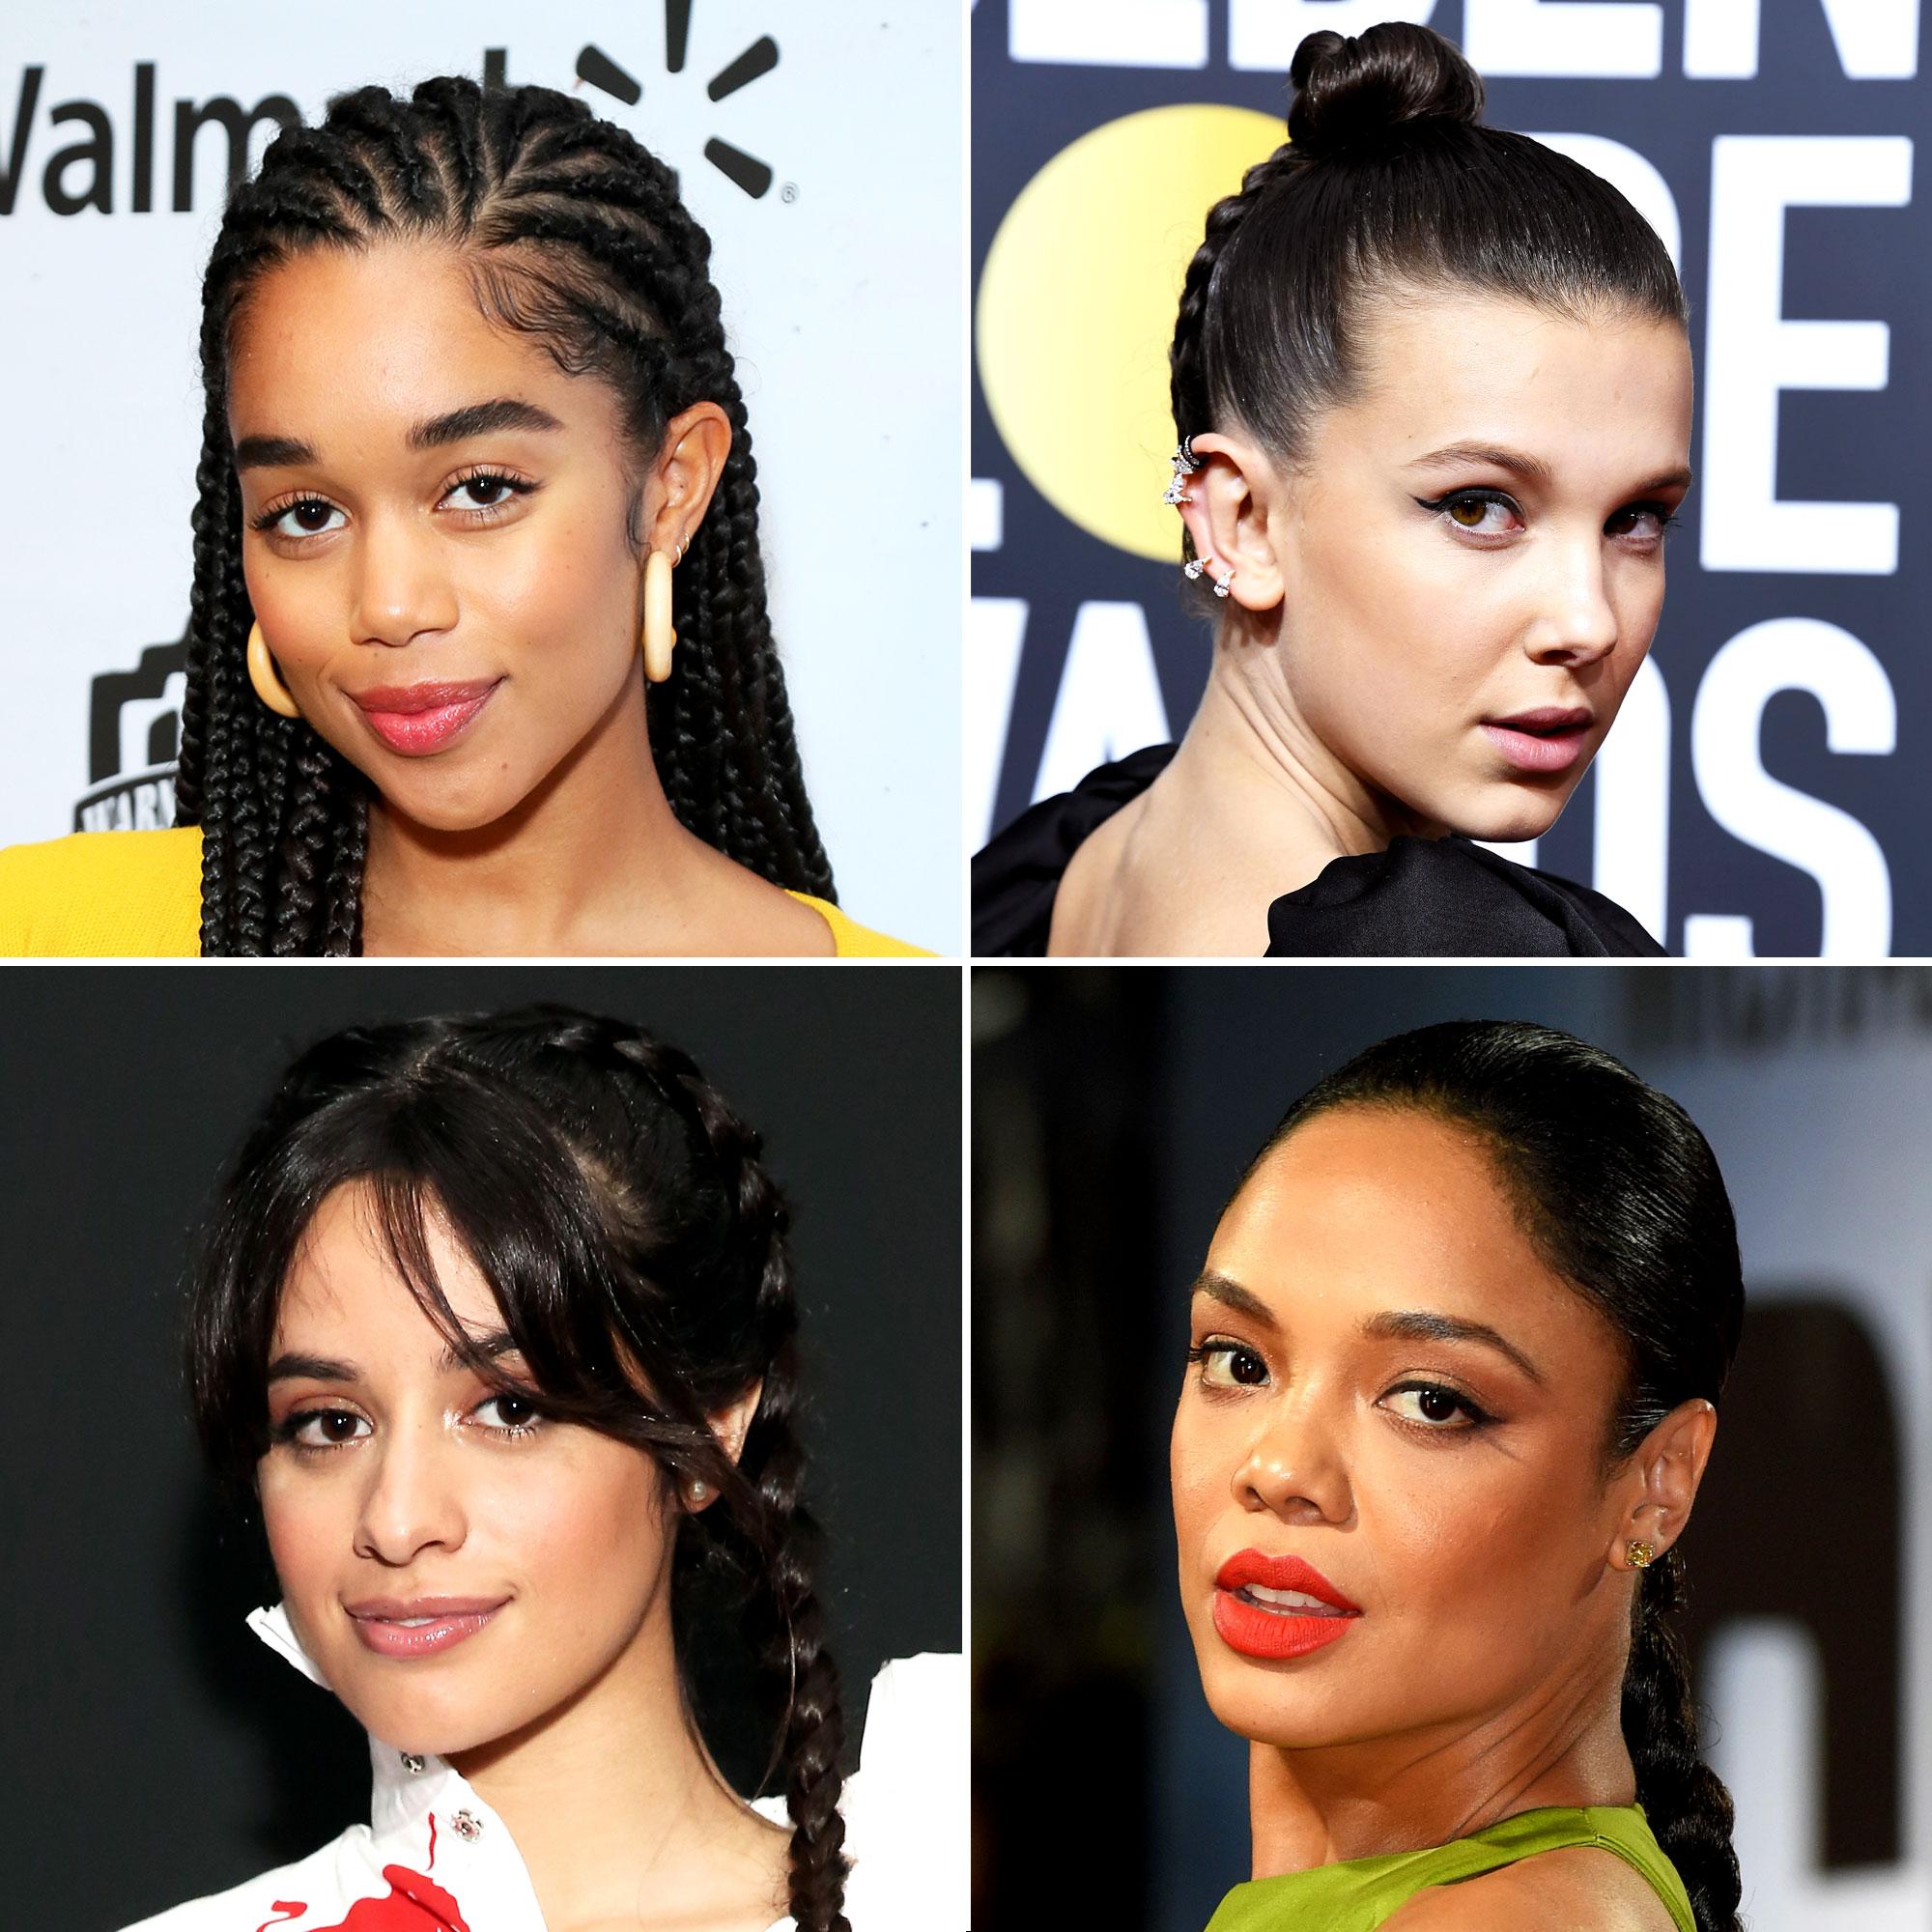 Celeb Braid Hairstyle Ideas: Camilla Cabello, Jennifer Lopez ...